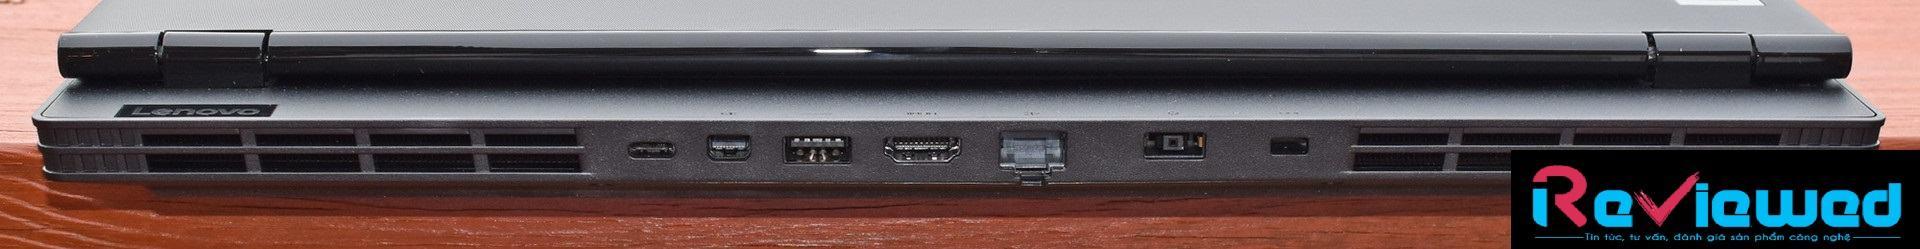 đánh giá laptop LenovoLegion Y530